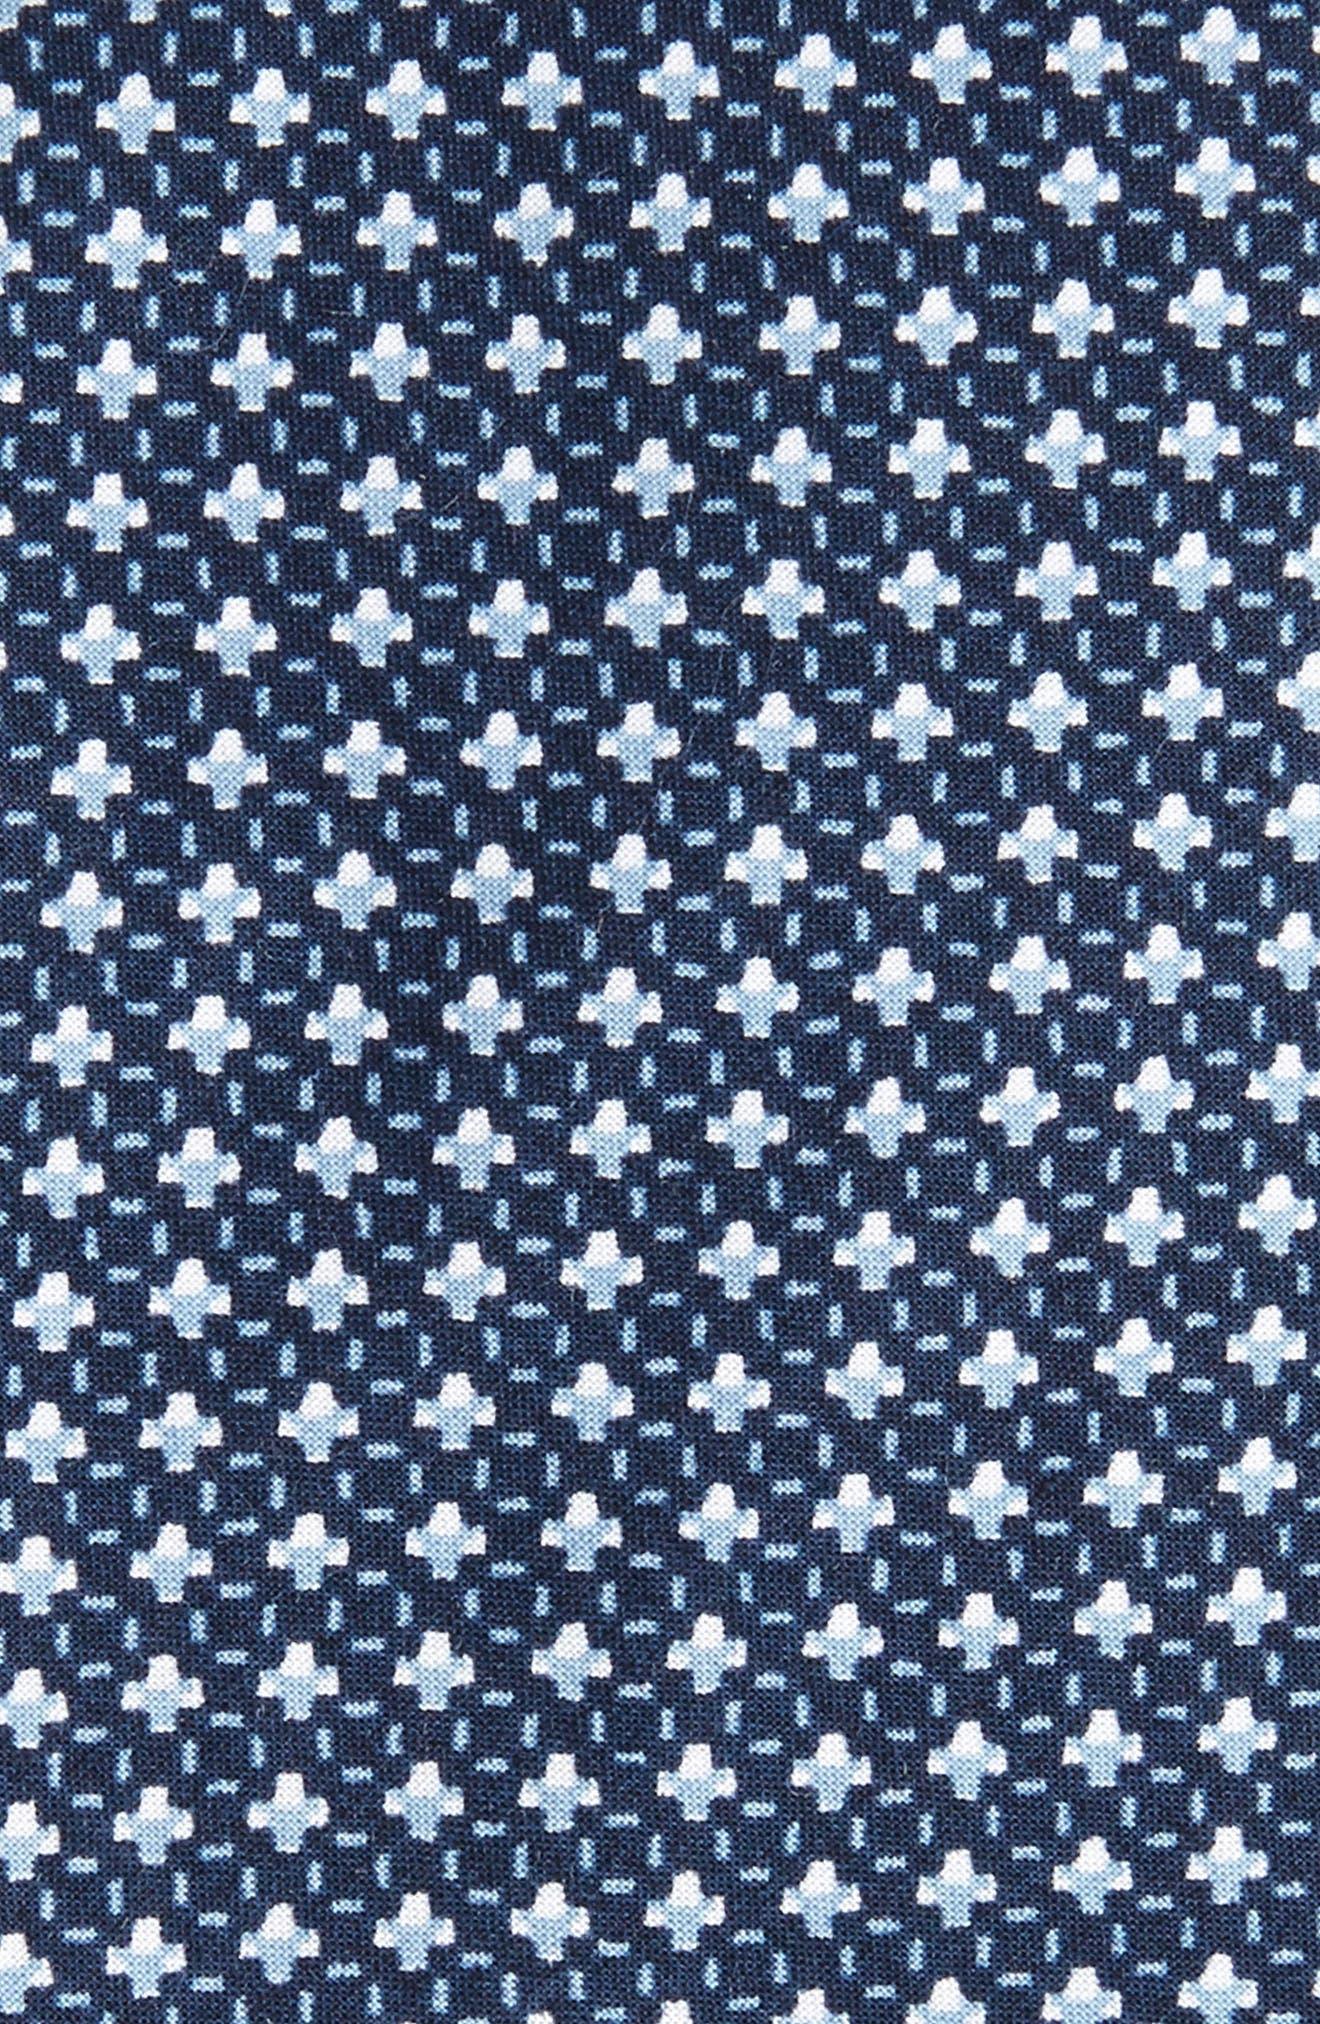 Regent Neat Coton Skinny Tie,                             Alternate thumbnail 2, color,                             001